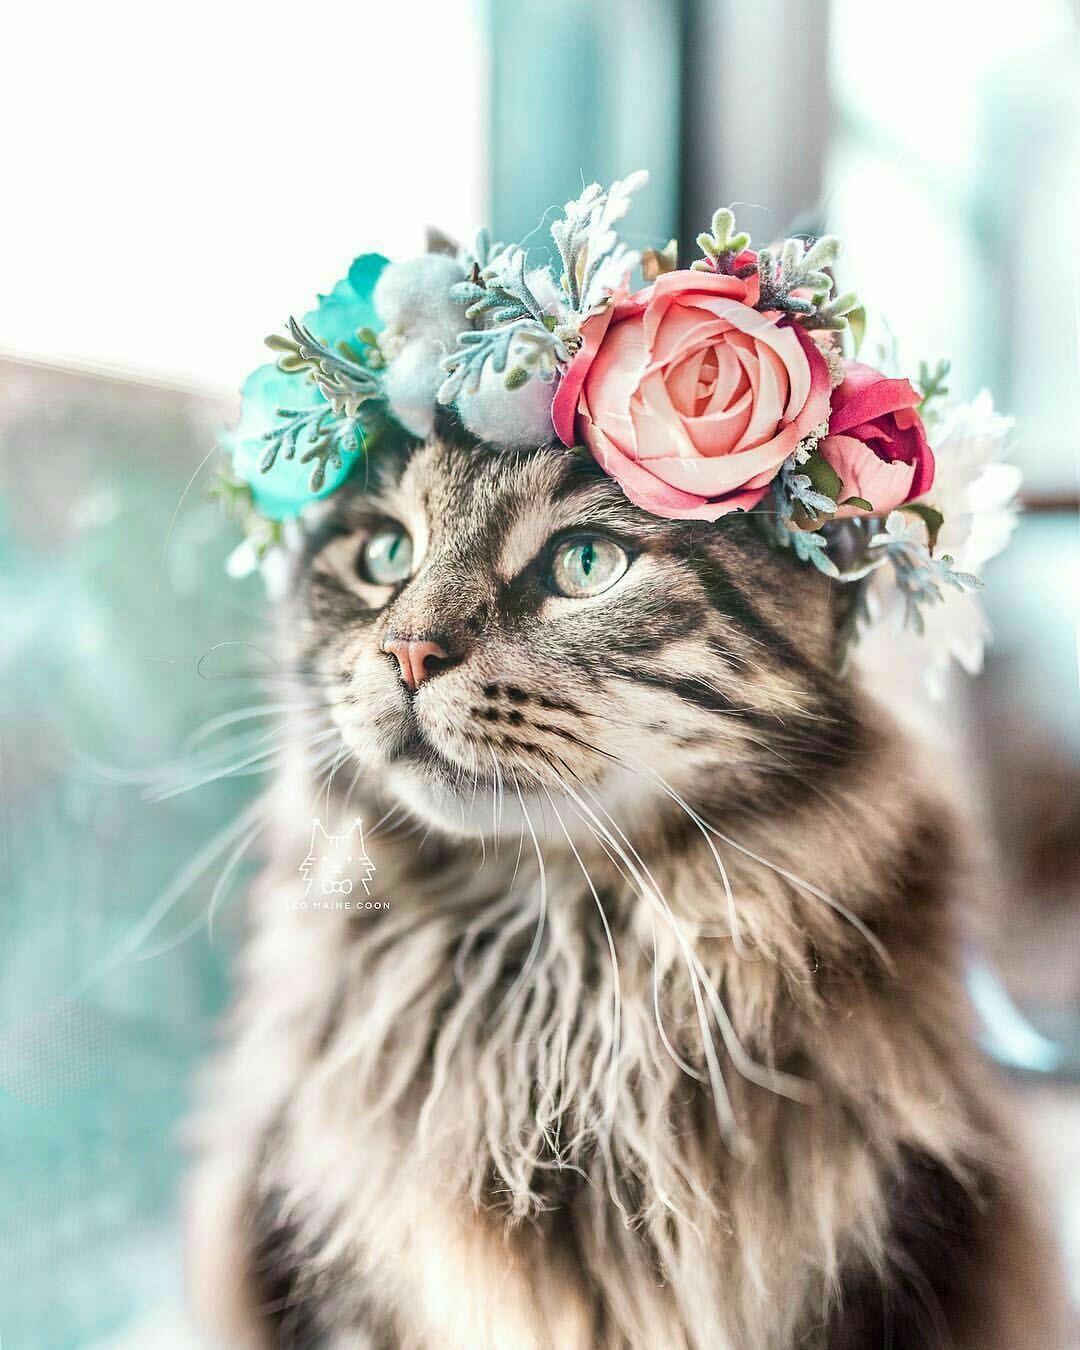 Pin By Farahrizqina On It Maliaa Beautiful Cats Cute Animals Cute Cats